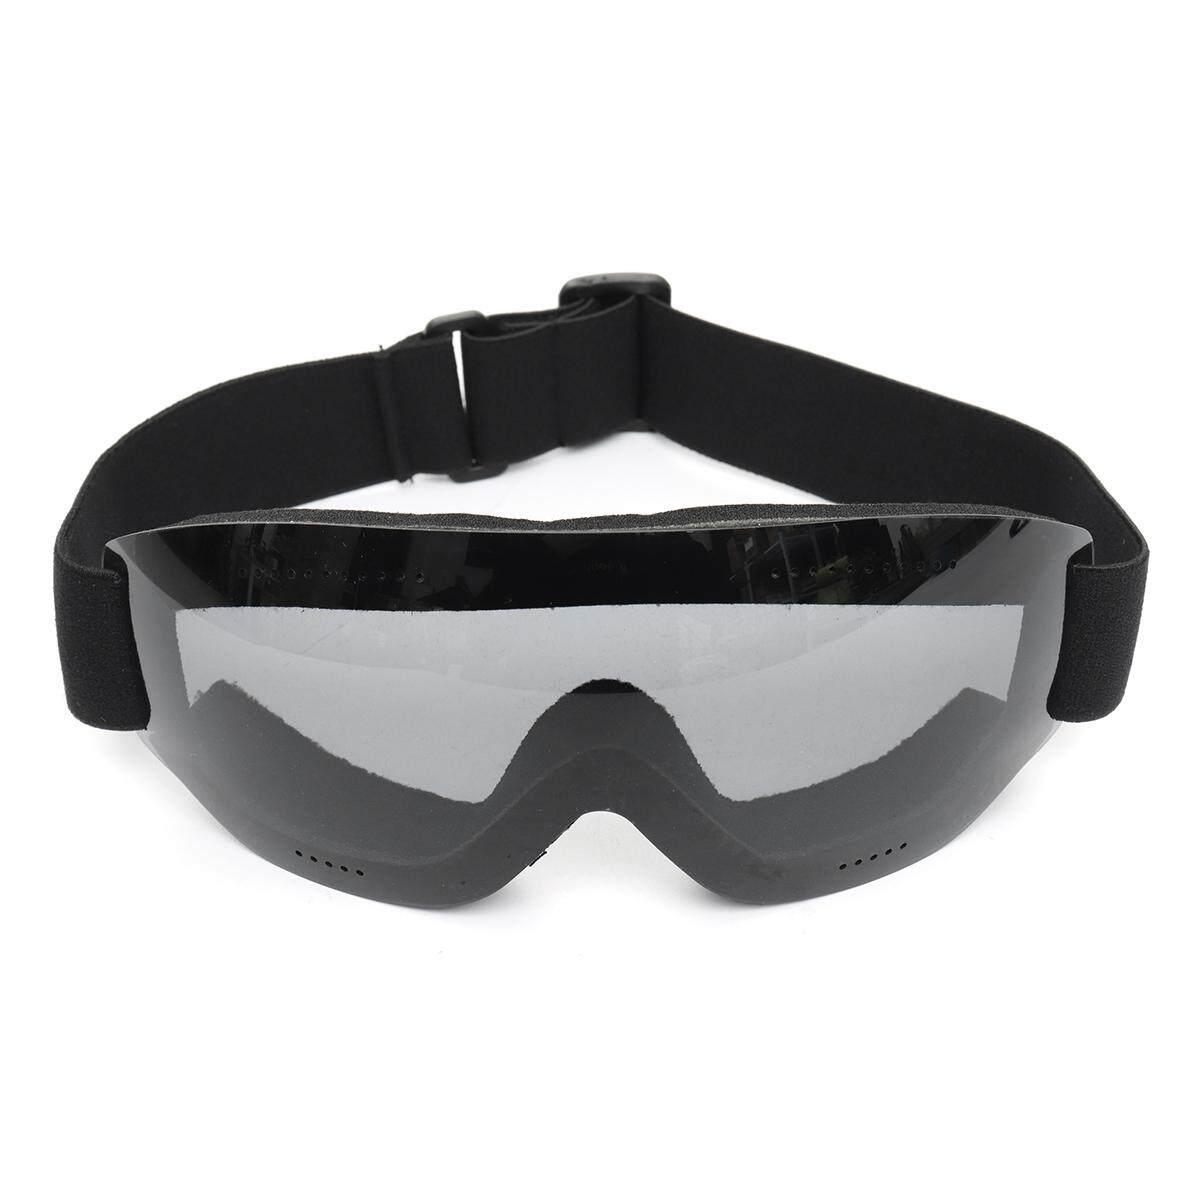 Frameless Anti-fog UV Protection Ski Glasses Skiing Goggles Snowboard Unisex Grey